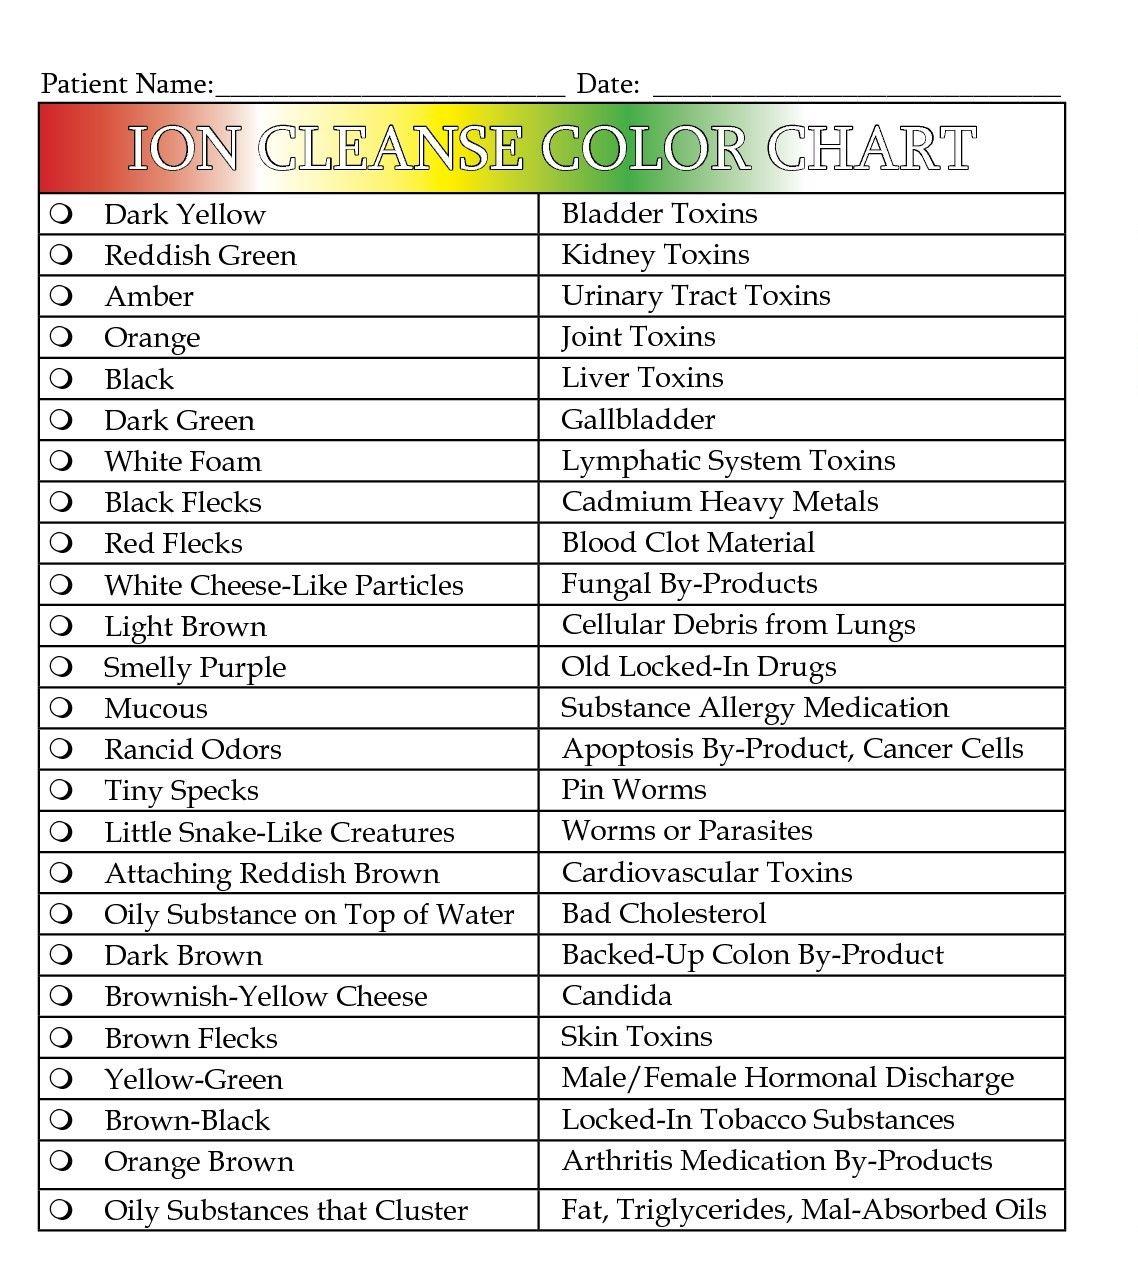 Ion cleanse color chart detox foot bath pinterest colour ion cleanse color chart body cleansedetox nvjuhfo Images